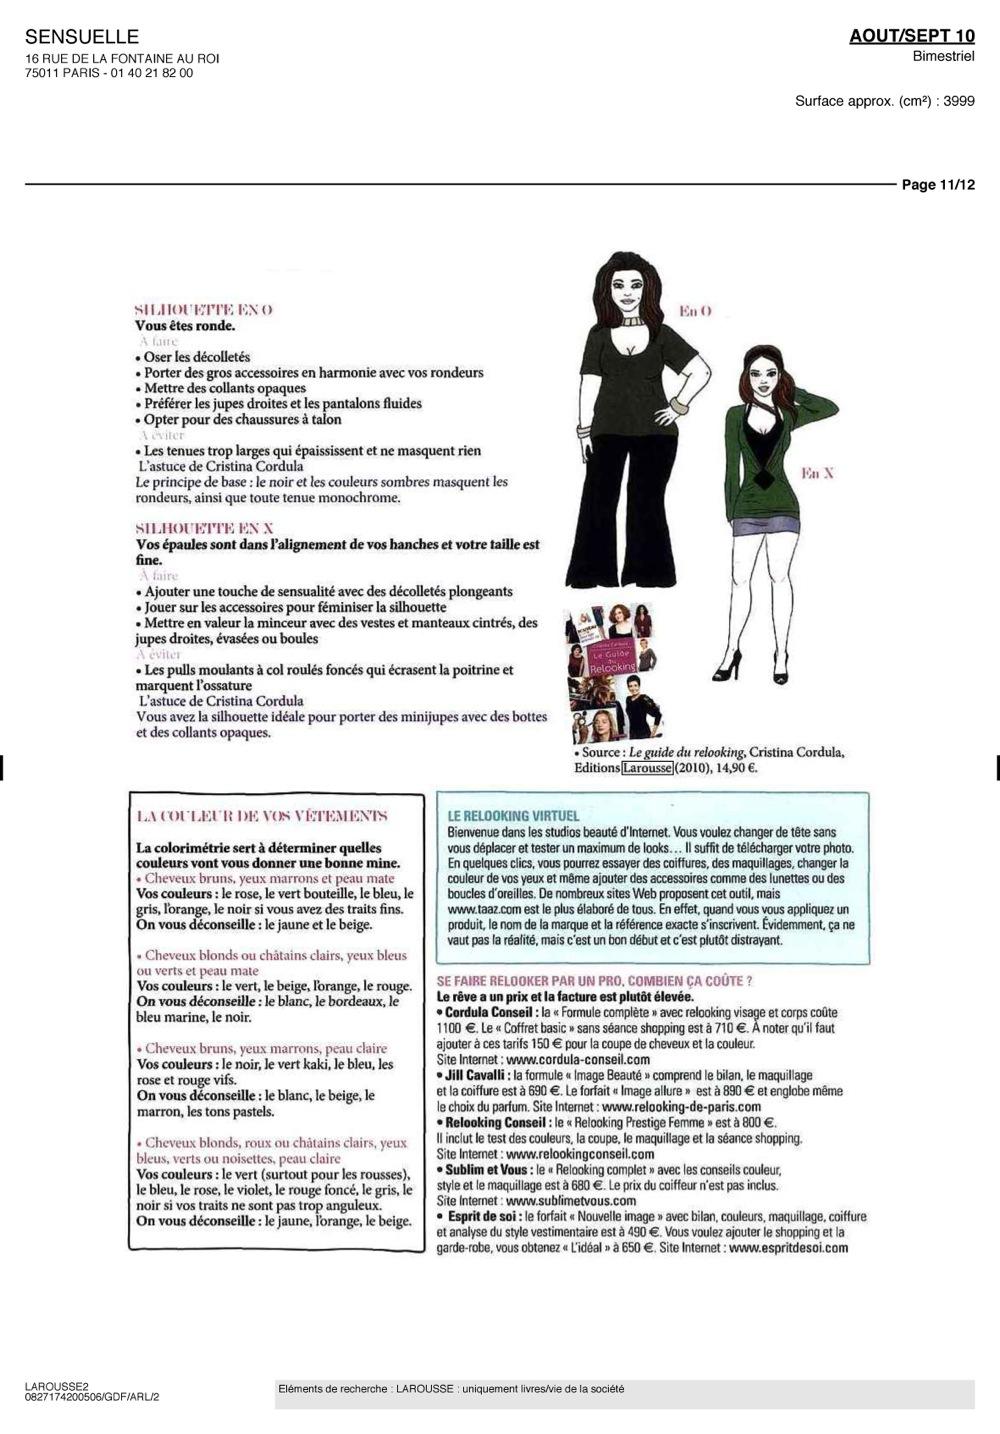 05-sensuelle-11_1000x1434-shkl_